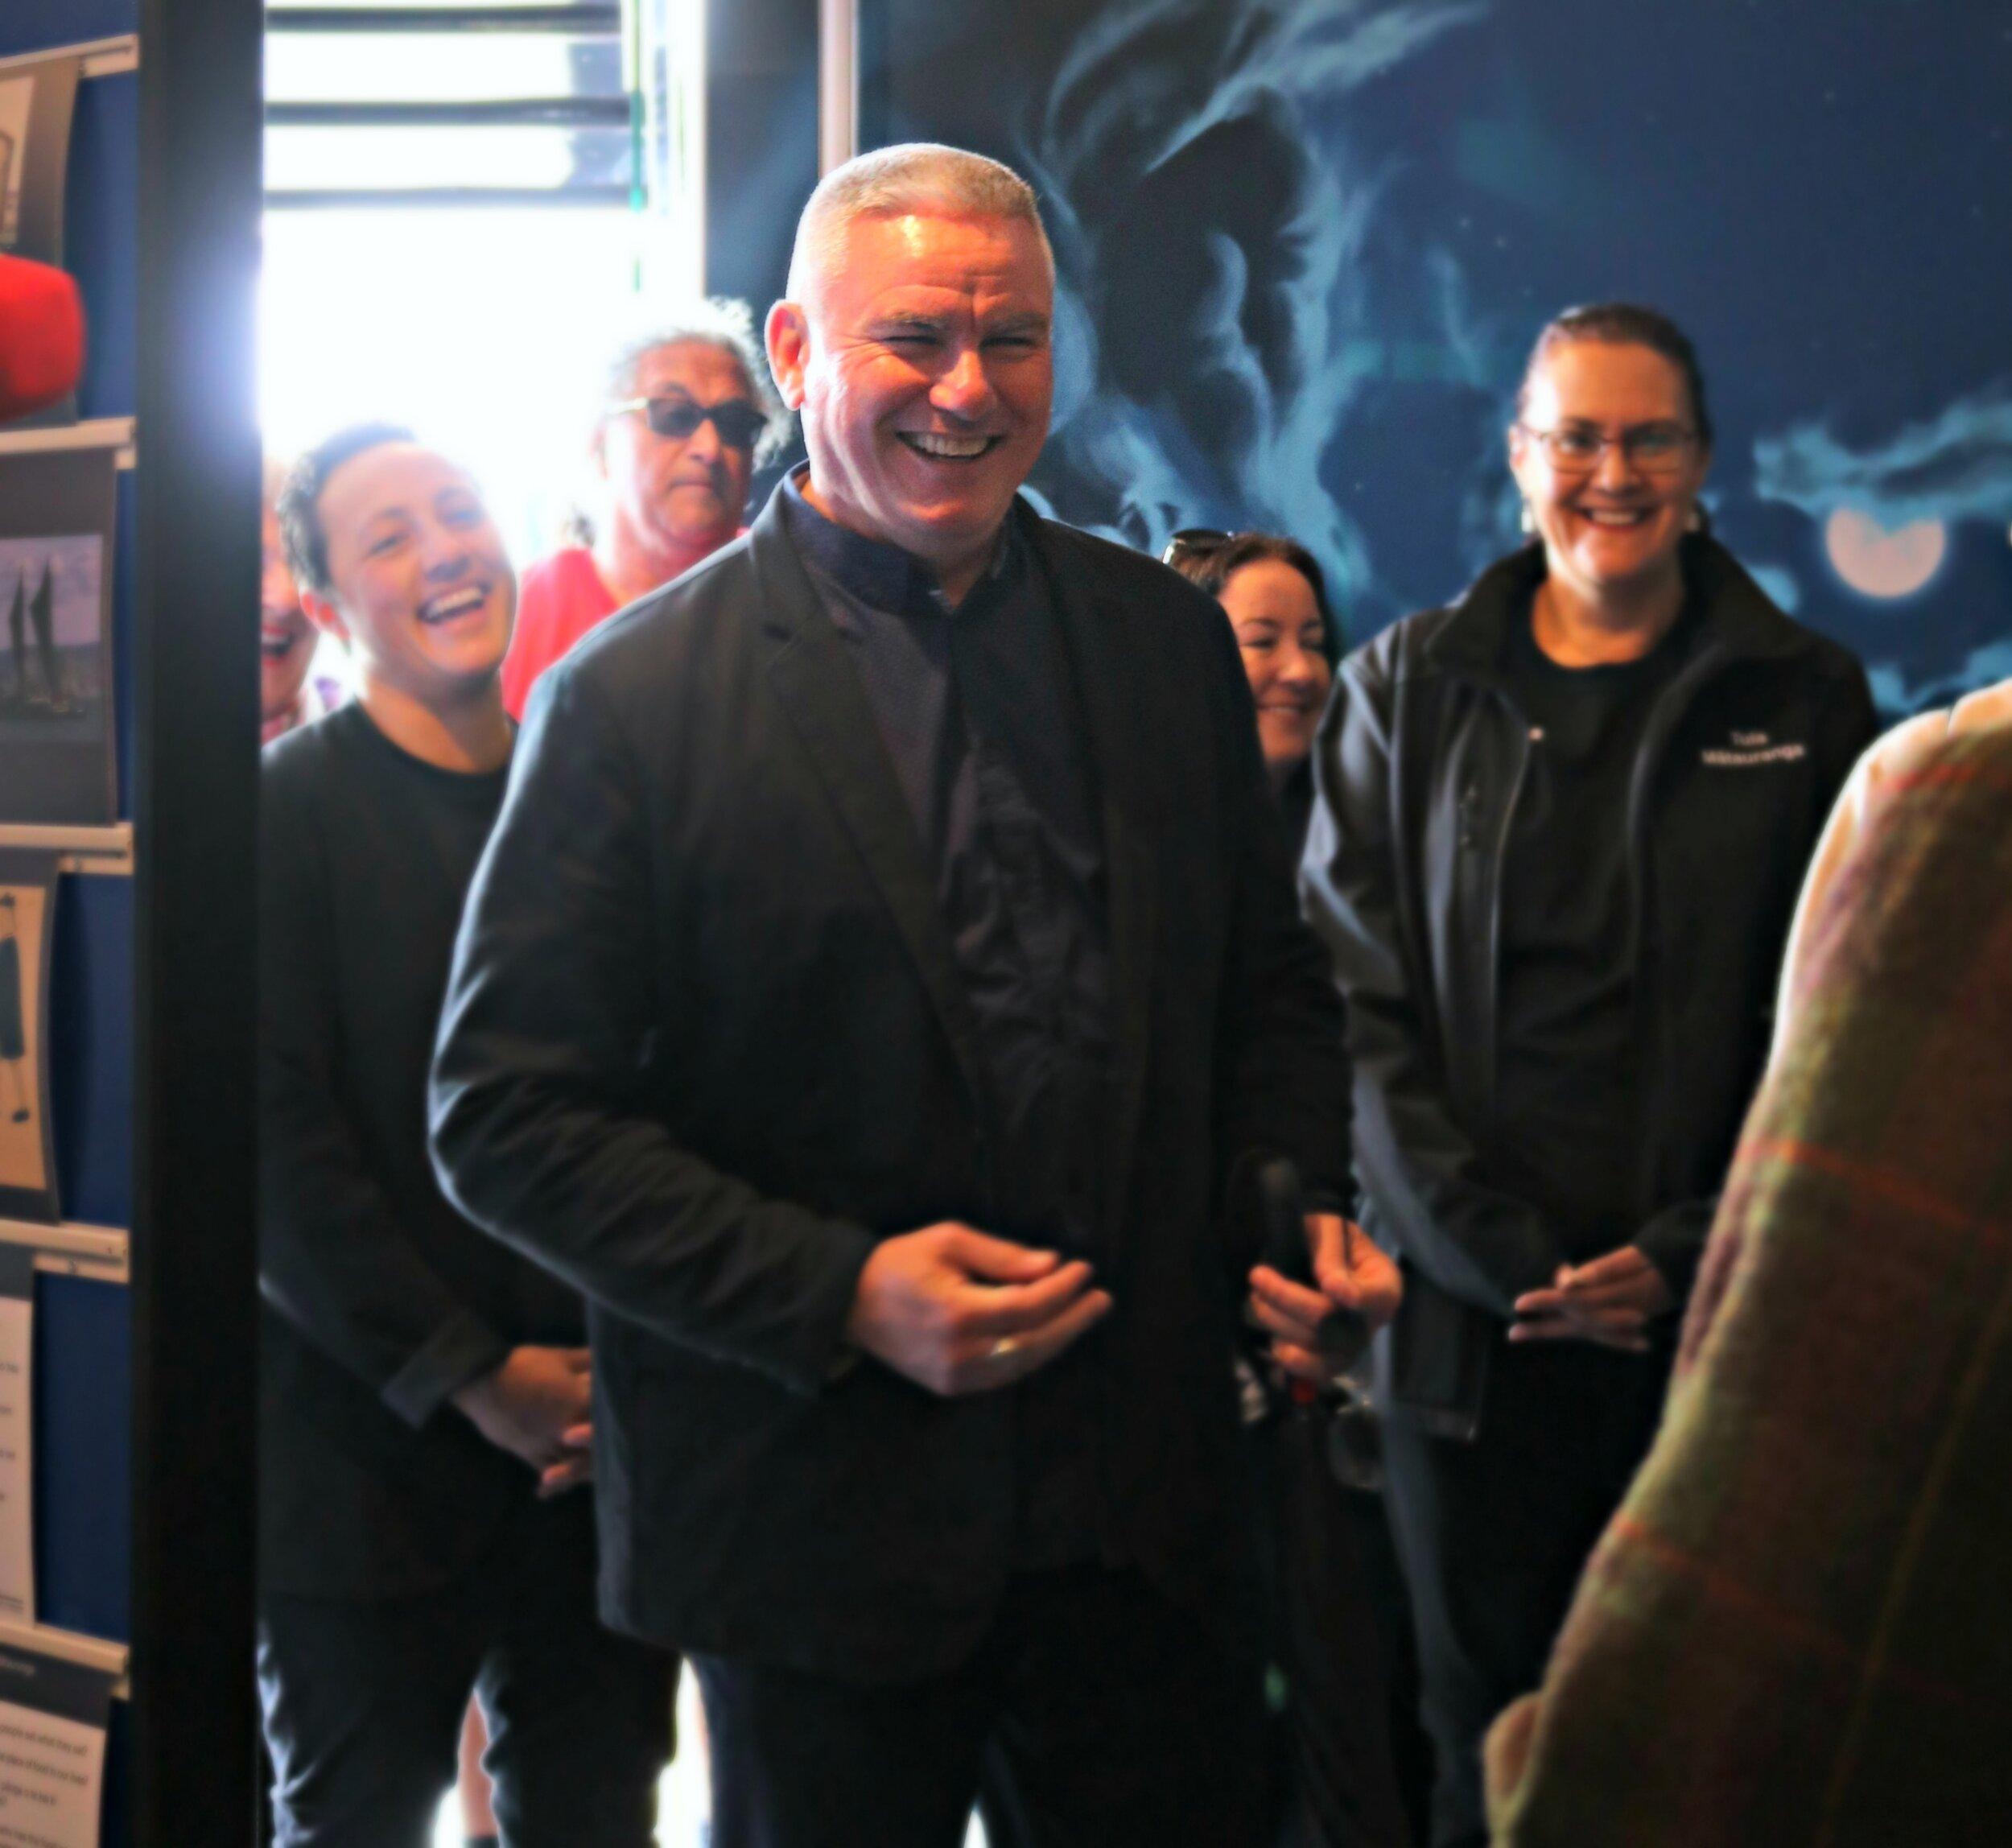 Minister for Māori Crown Relations: Te Arawhiti Kelvin Davis attends the opening of the roadshow in  Tūranga-nui-a-Kiwa - Gisborne.